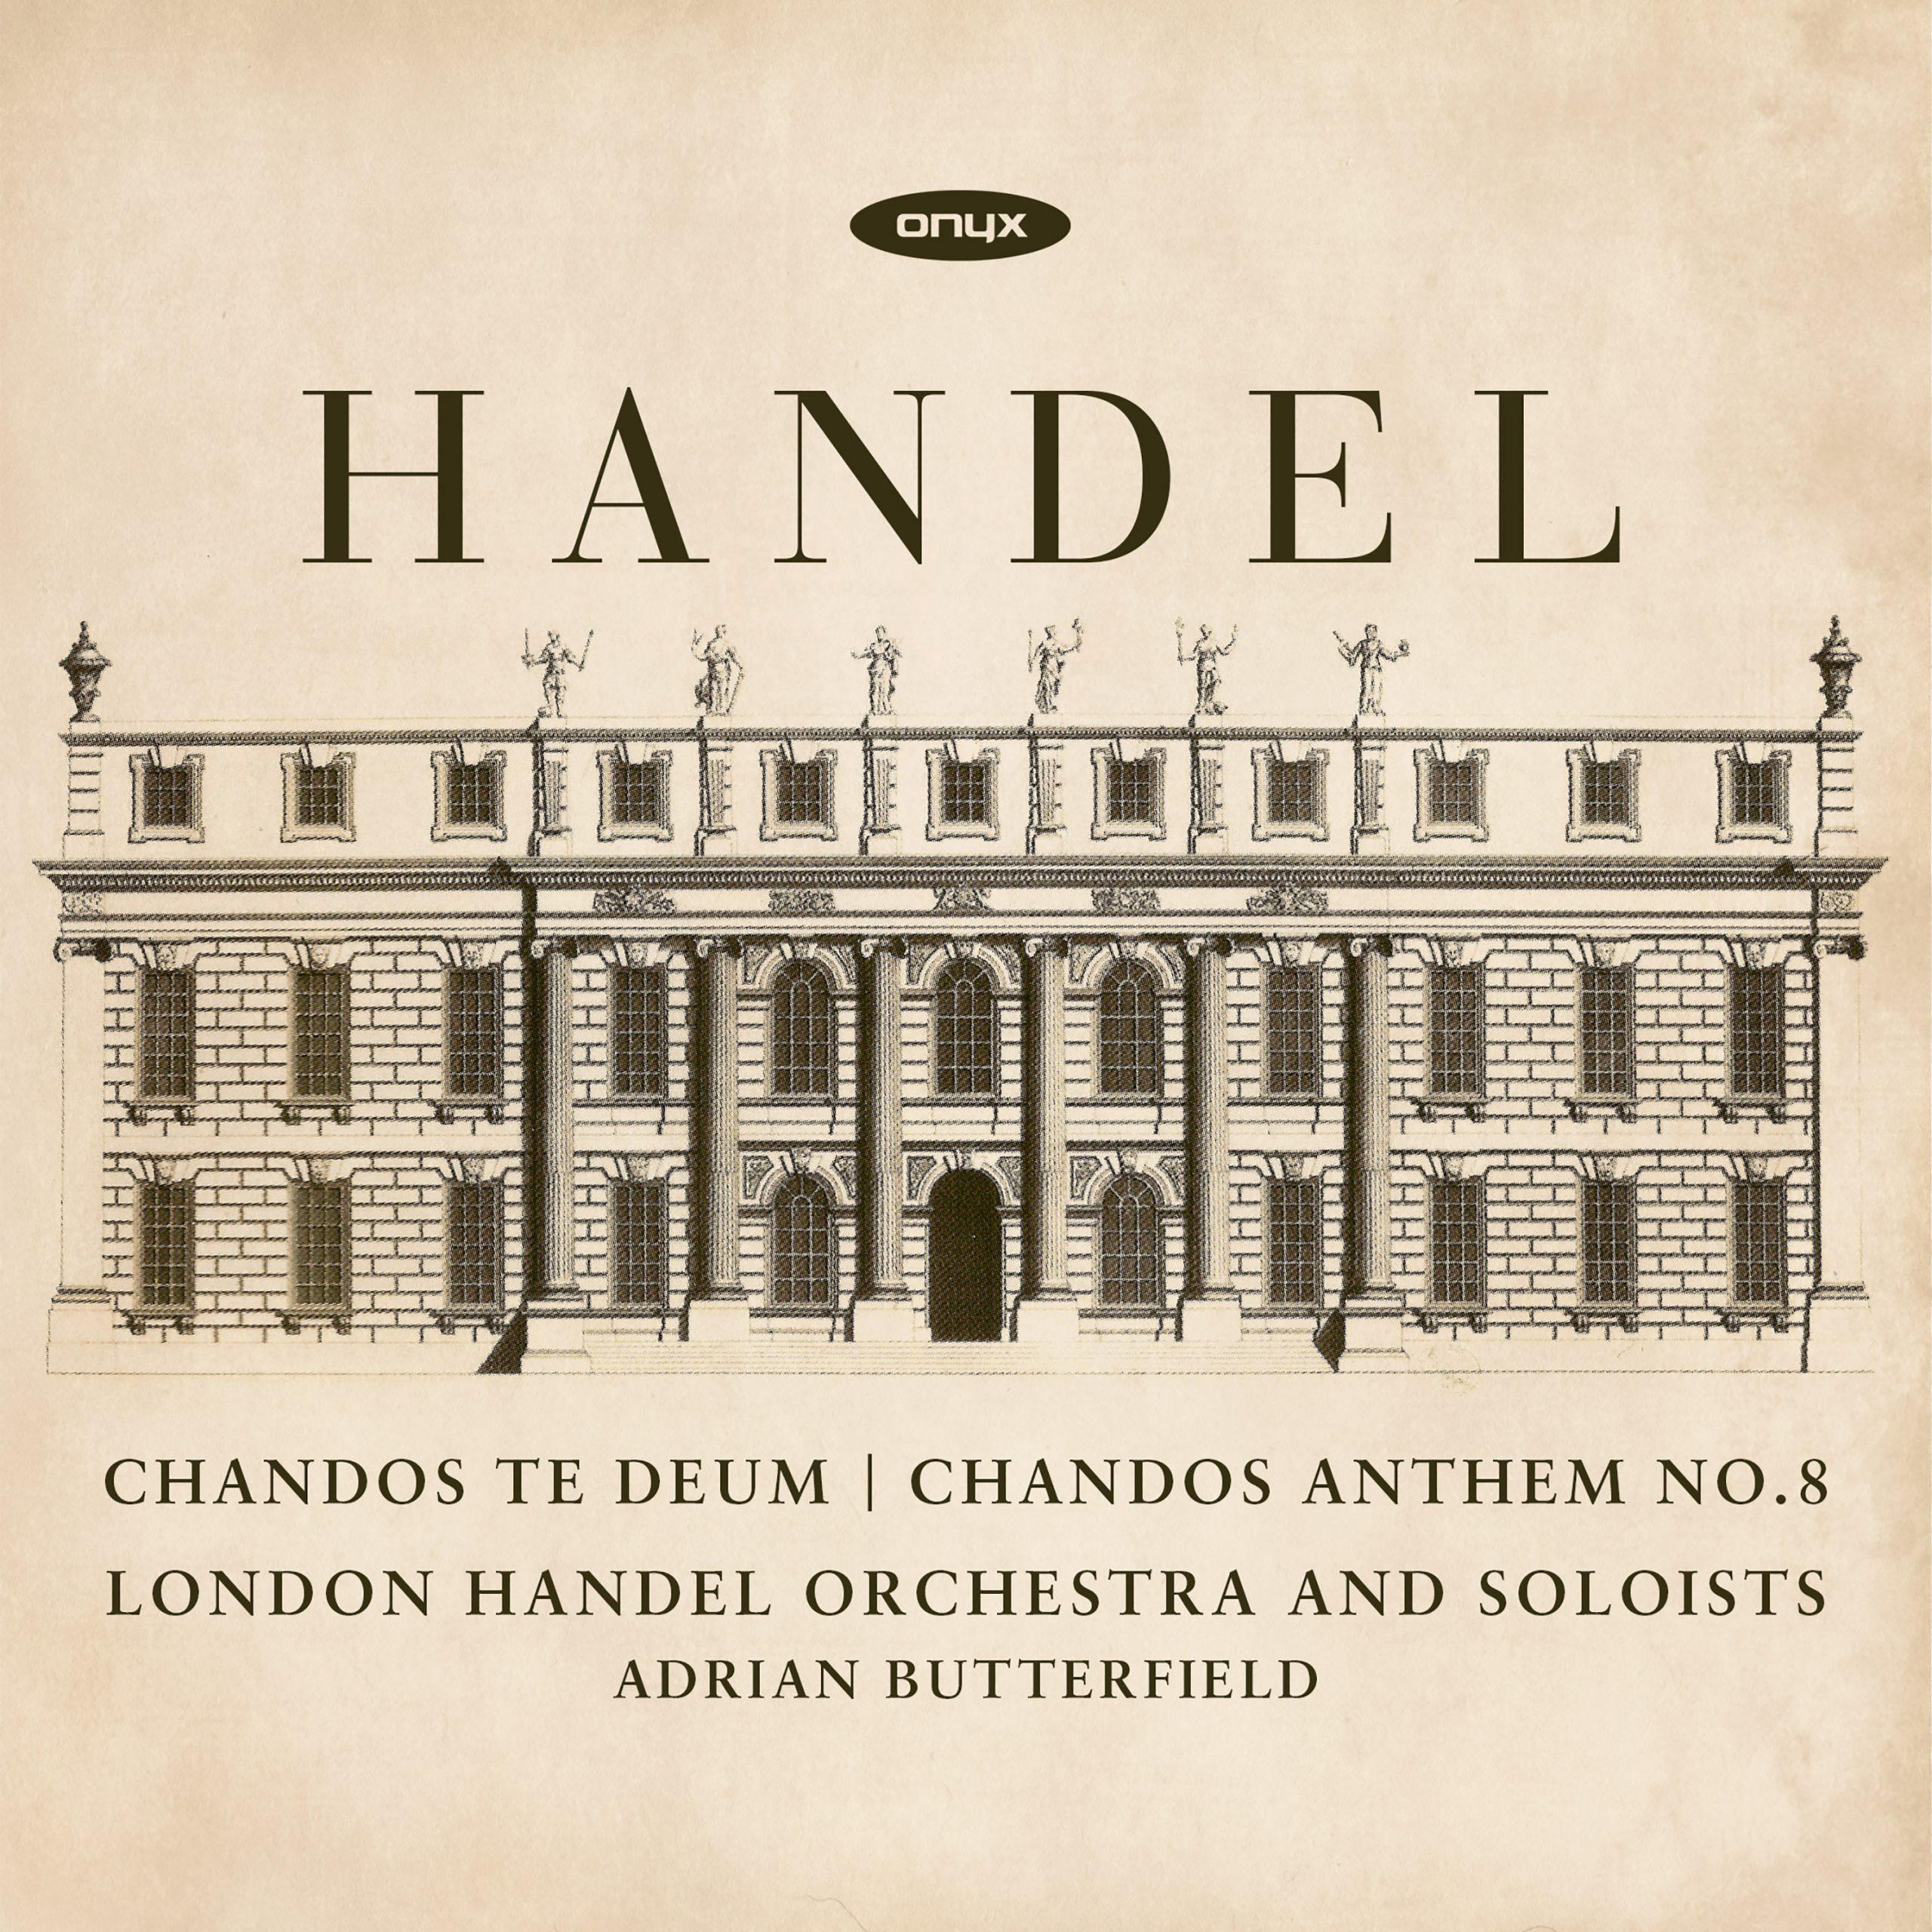 Handel: Te Deum, HWV 281; Chandos Anthem No. 8, HWV 253